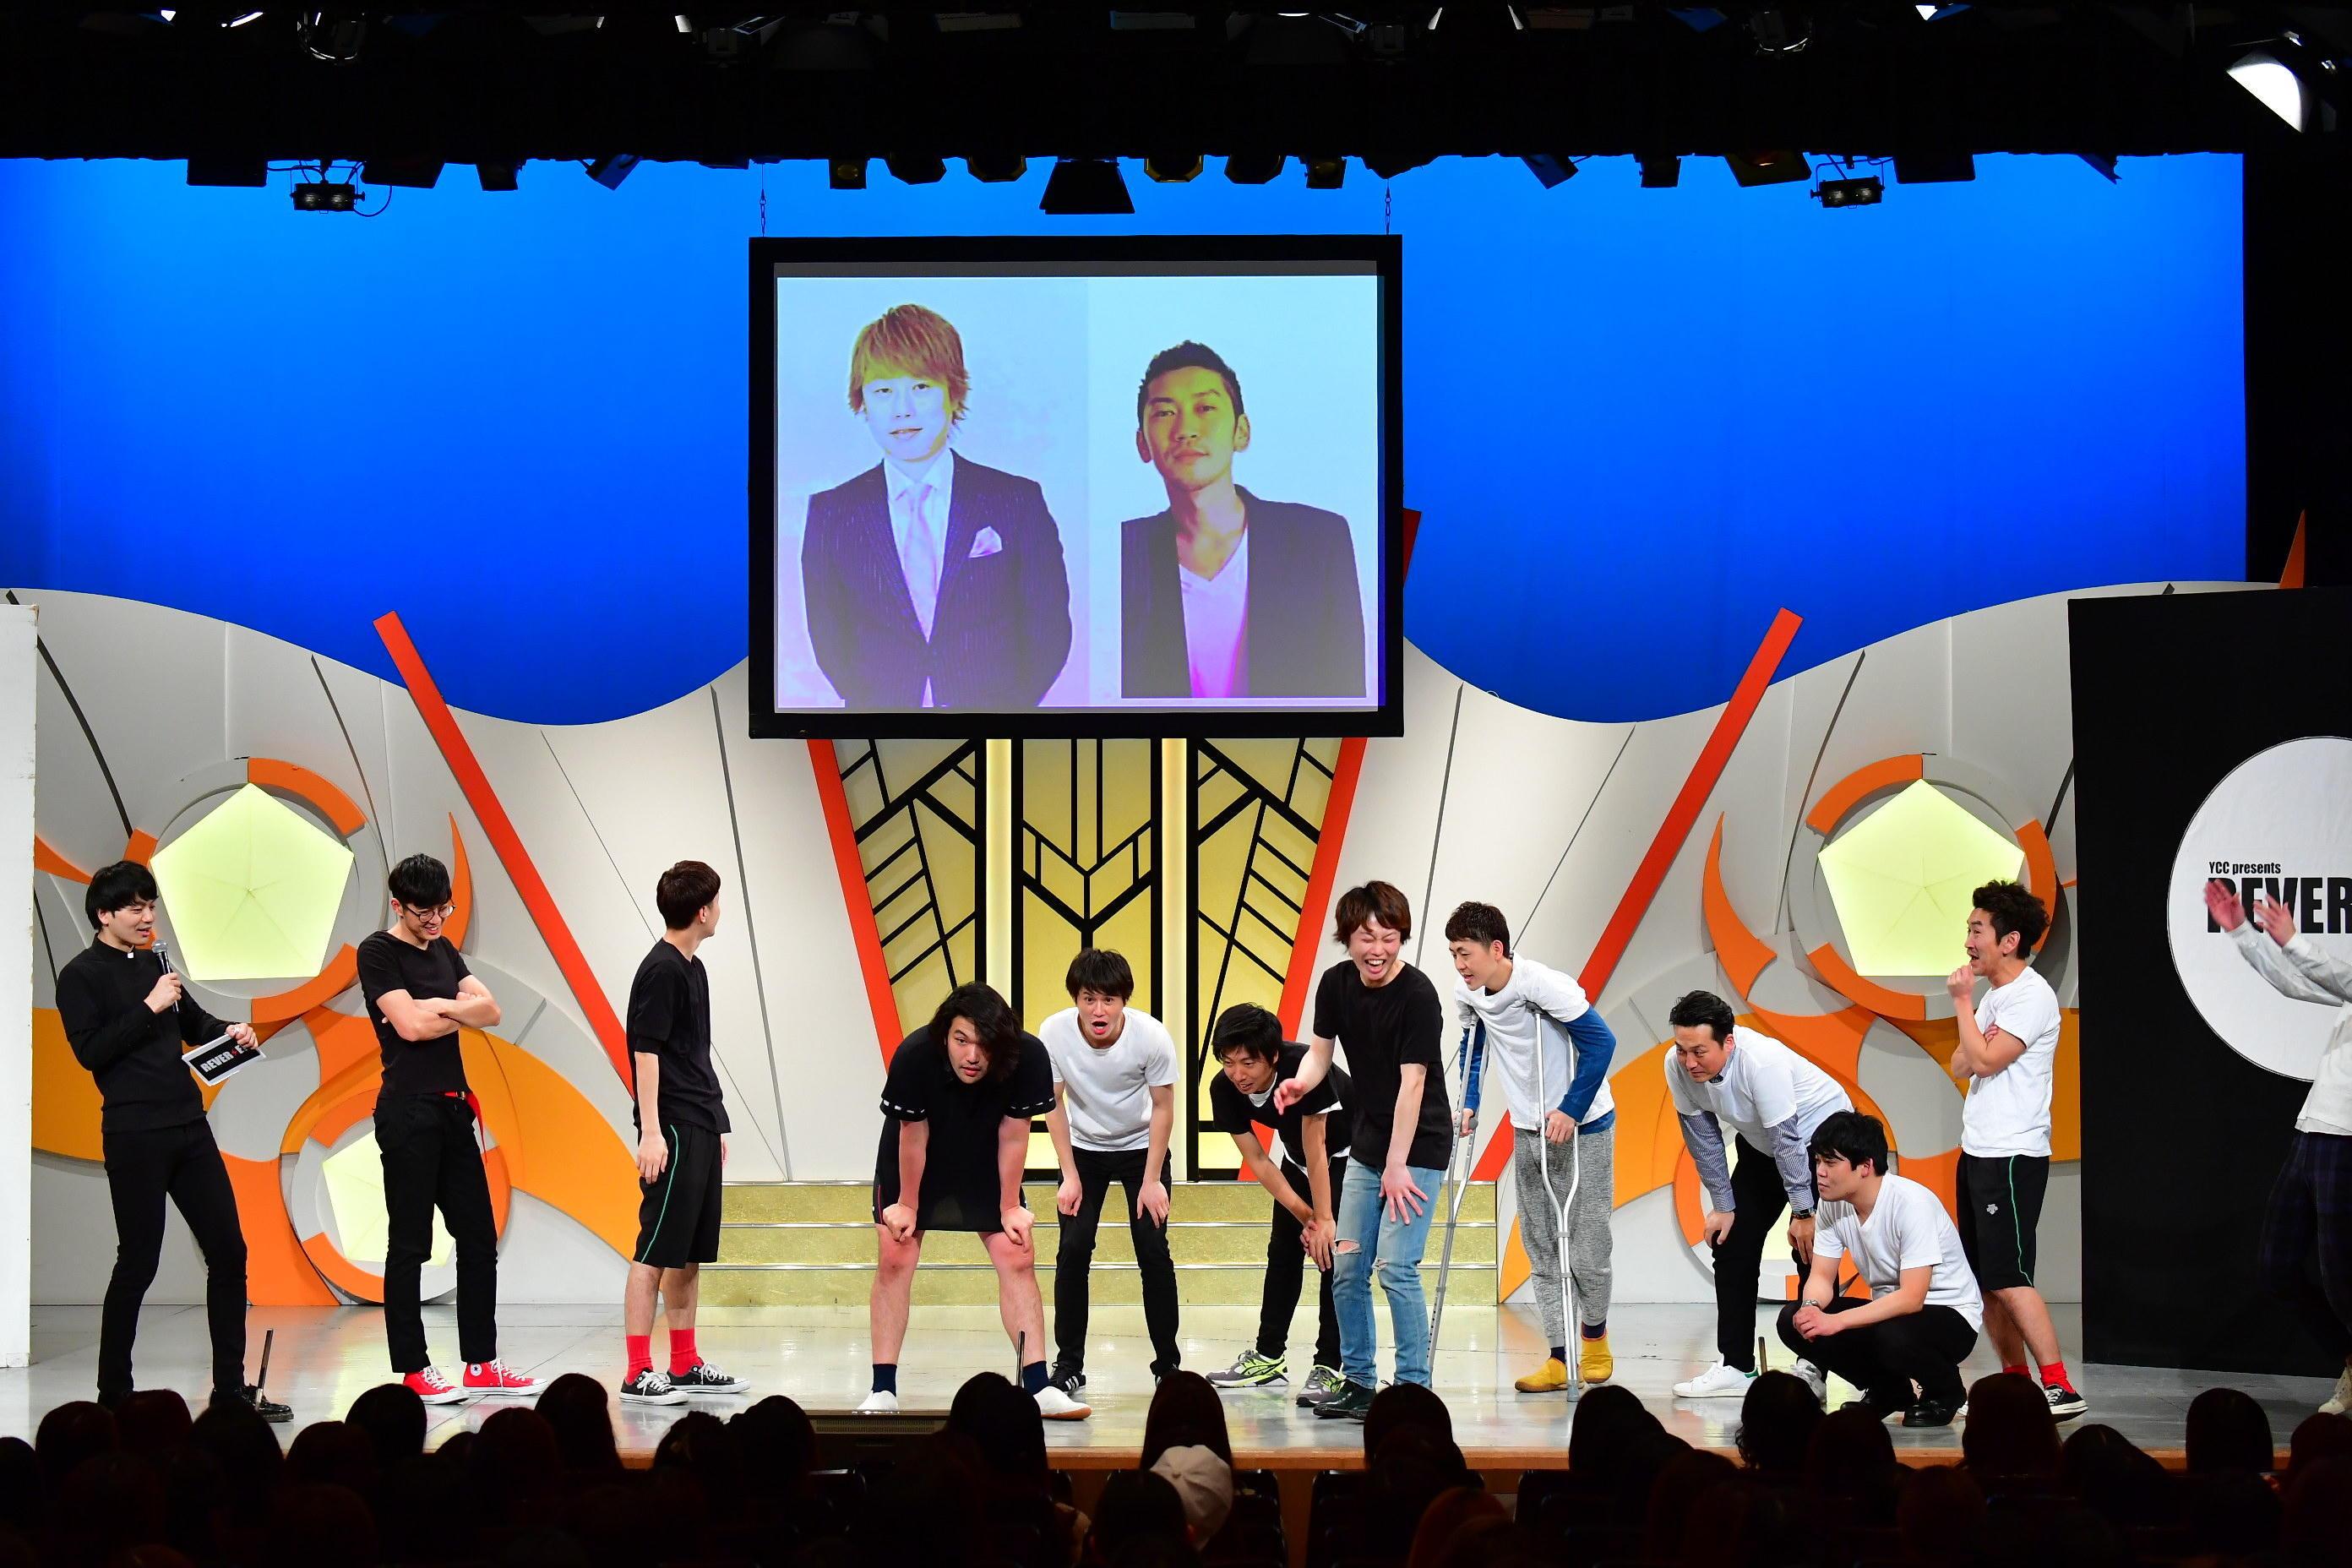 http://news.yoshimoto.co.jp/20180305134528-f971355108471ca9d0ca36fc1a5d9ccc34c4c8b6.jpg